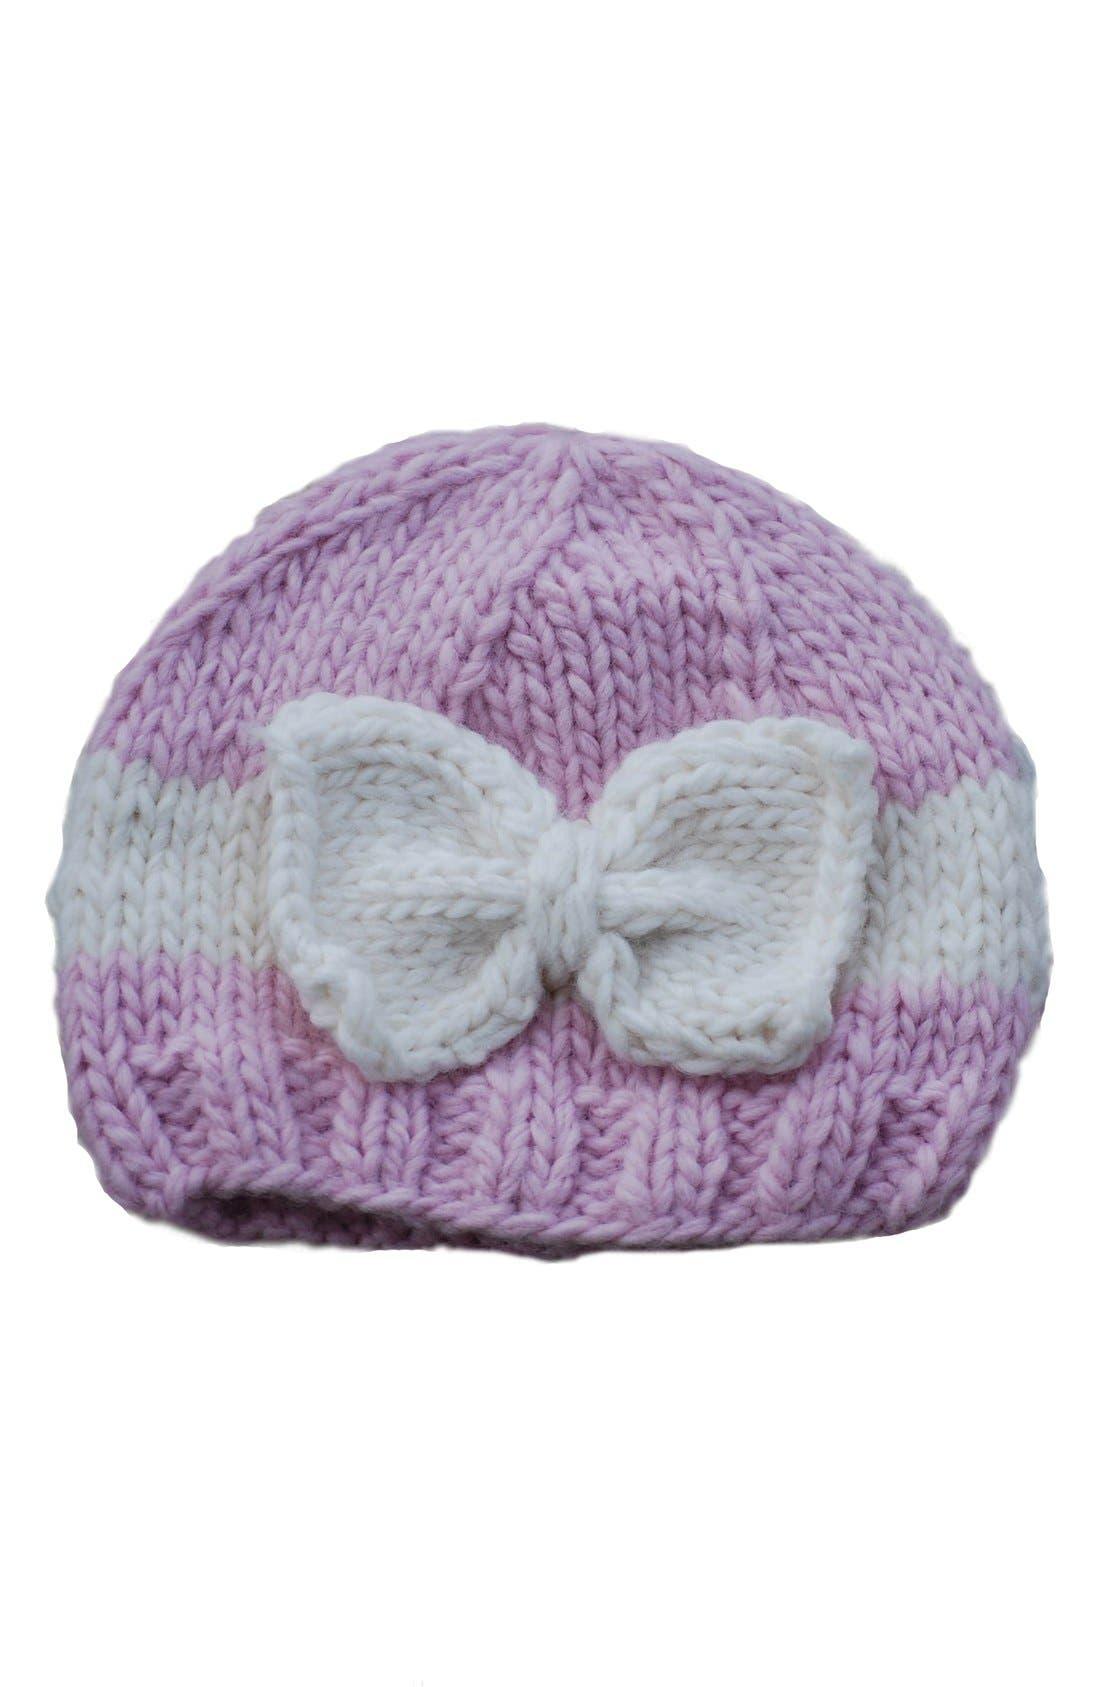 BLUEBERRY HILL 'Sabrina' Knit Cap